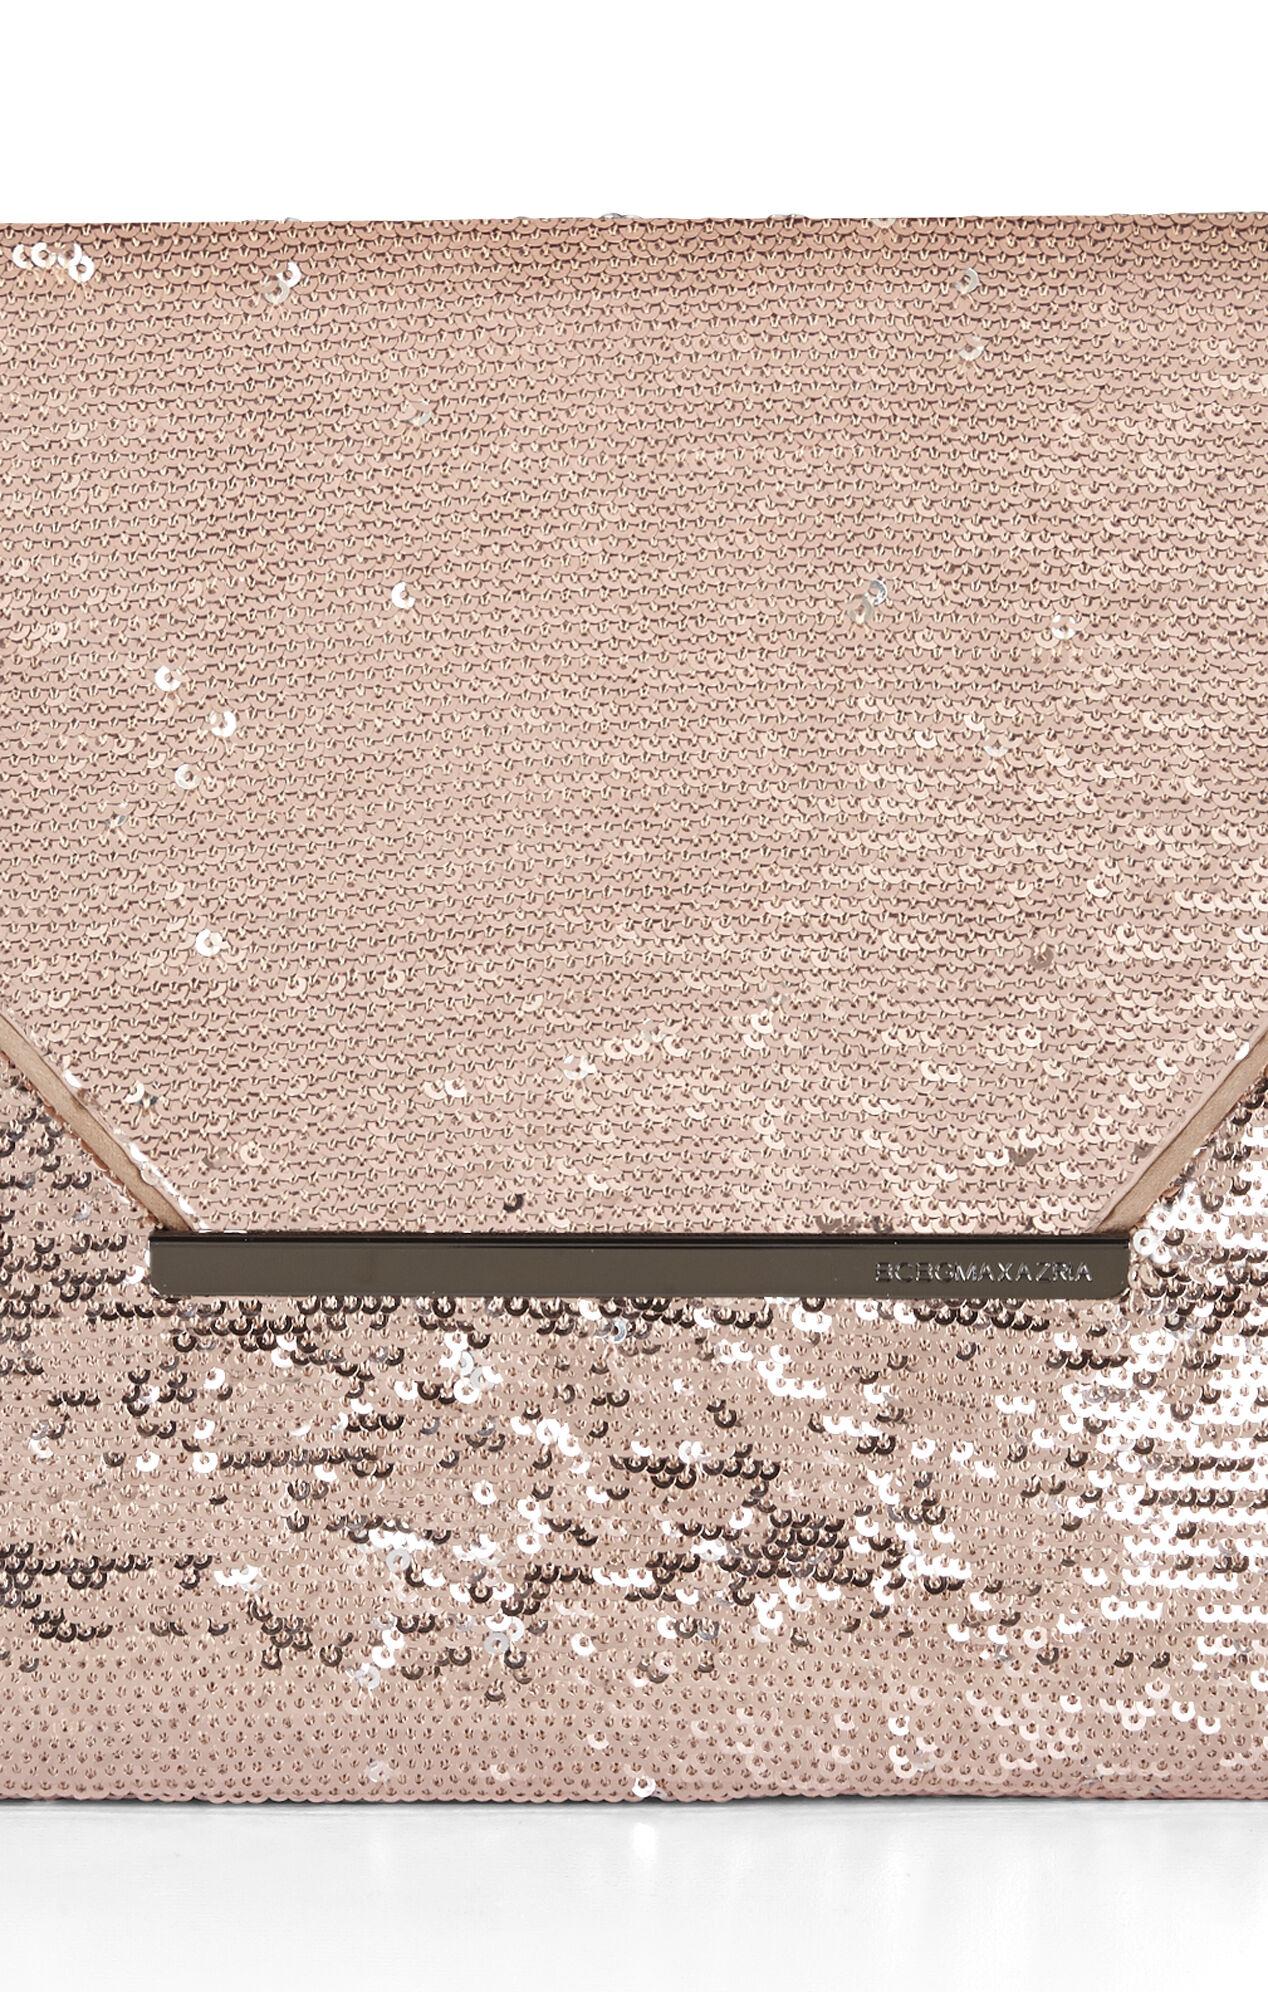 Harlow Sequined Envelope Clutch